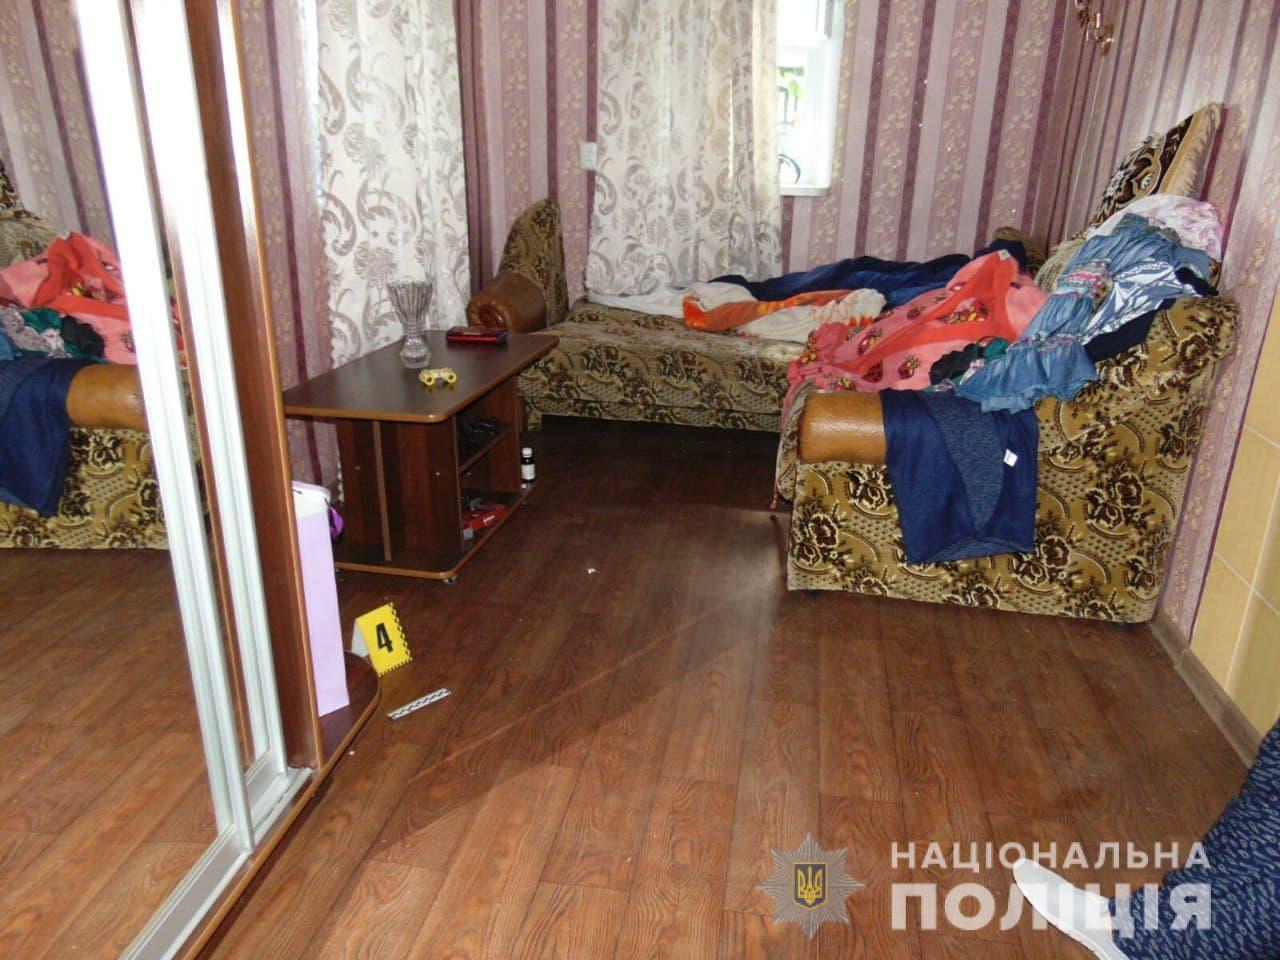 Черкащанин пограбував будинок односельчанки